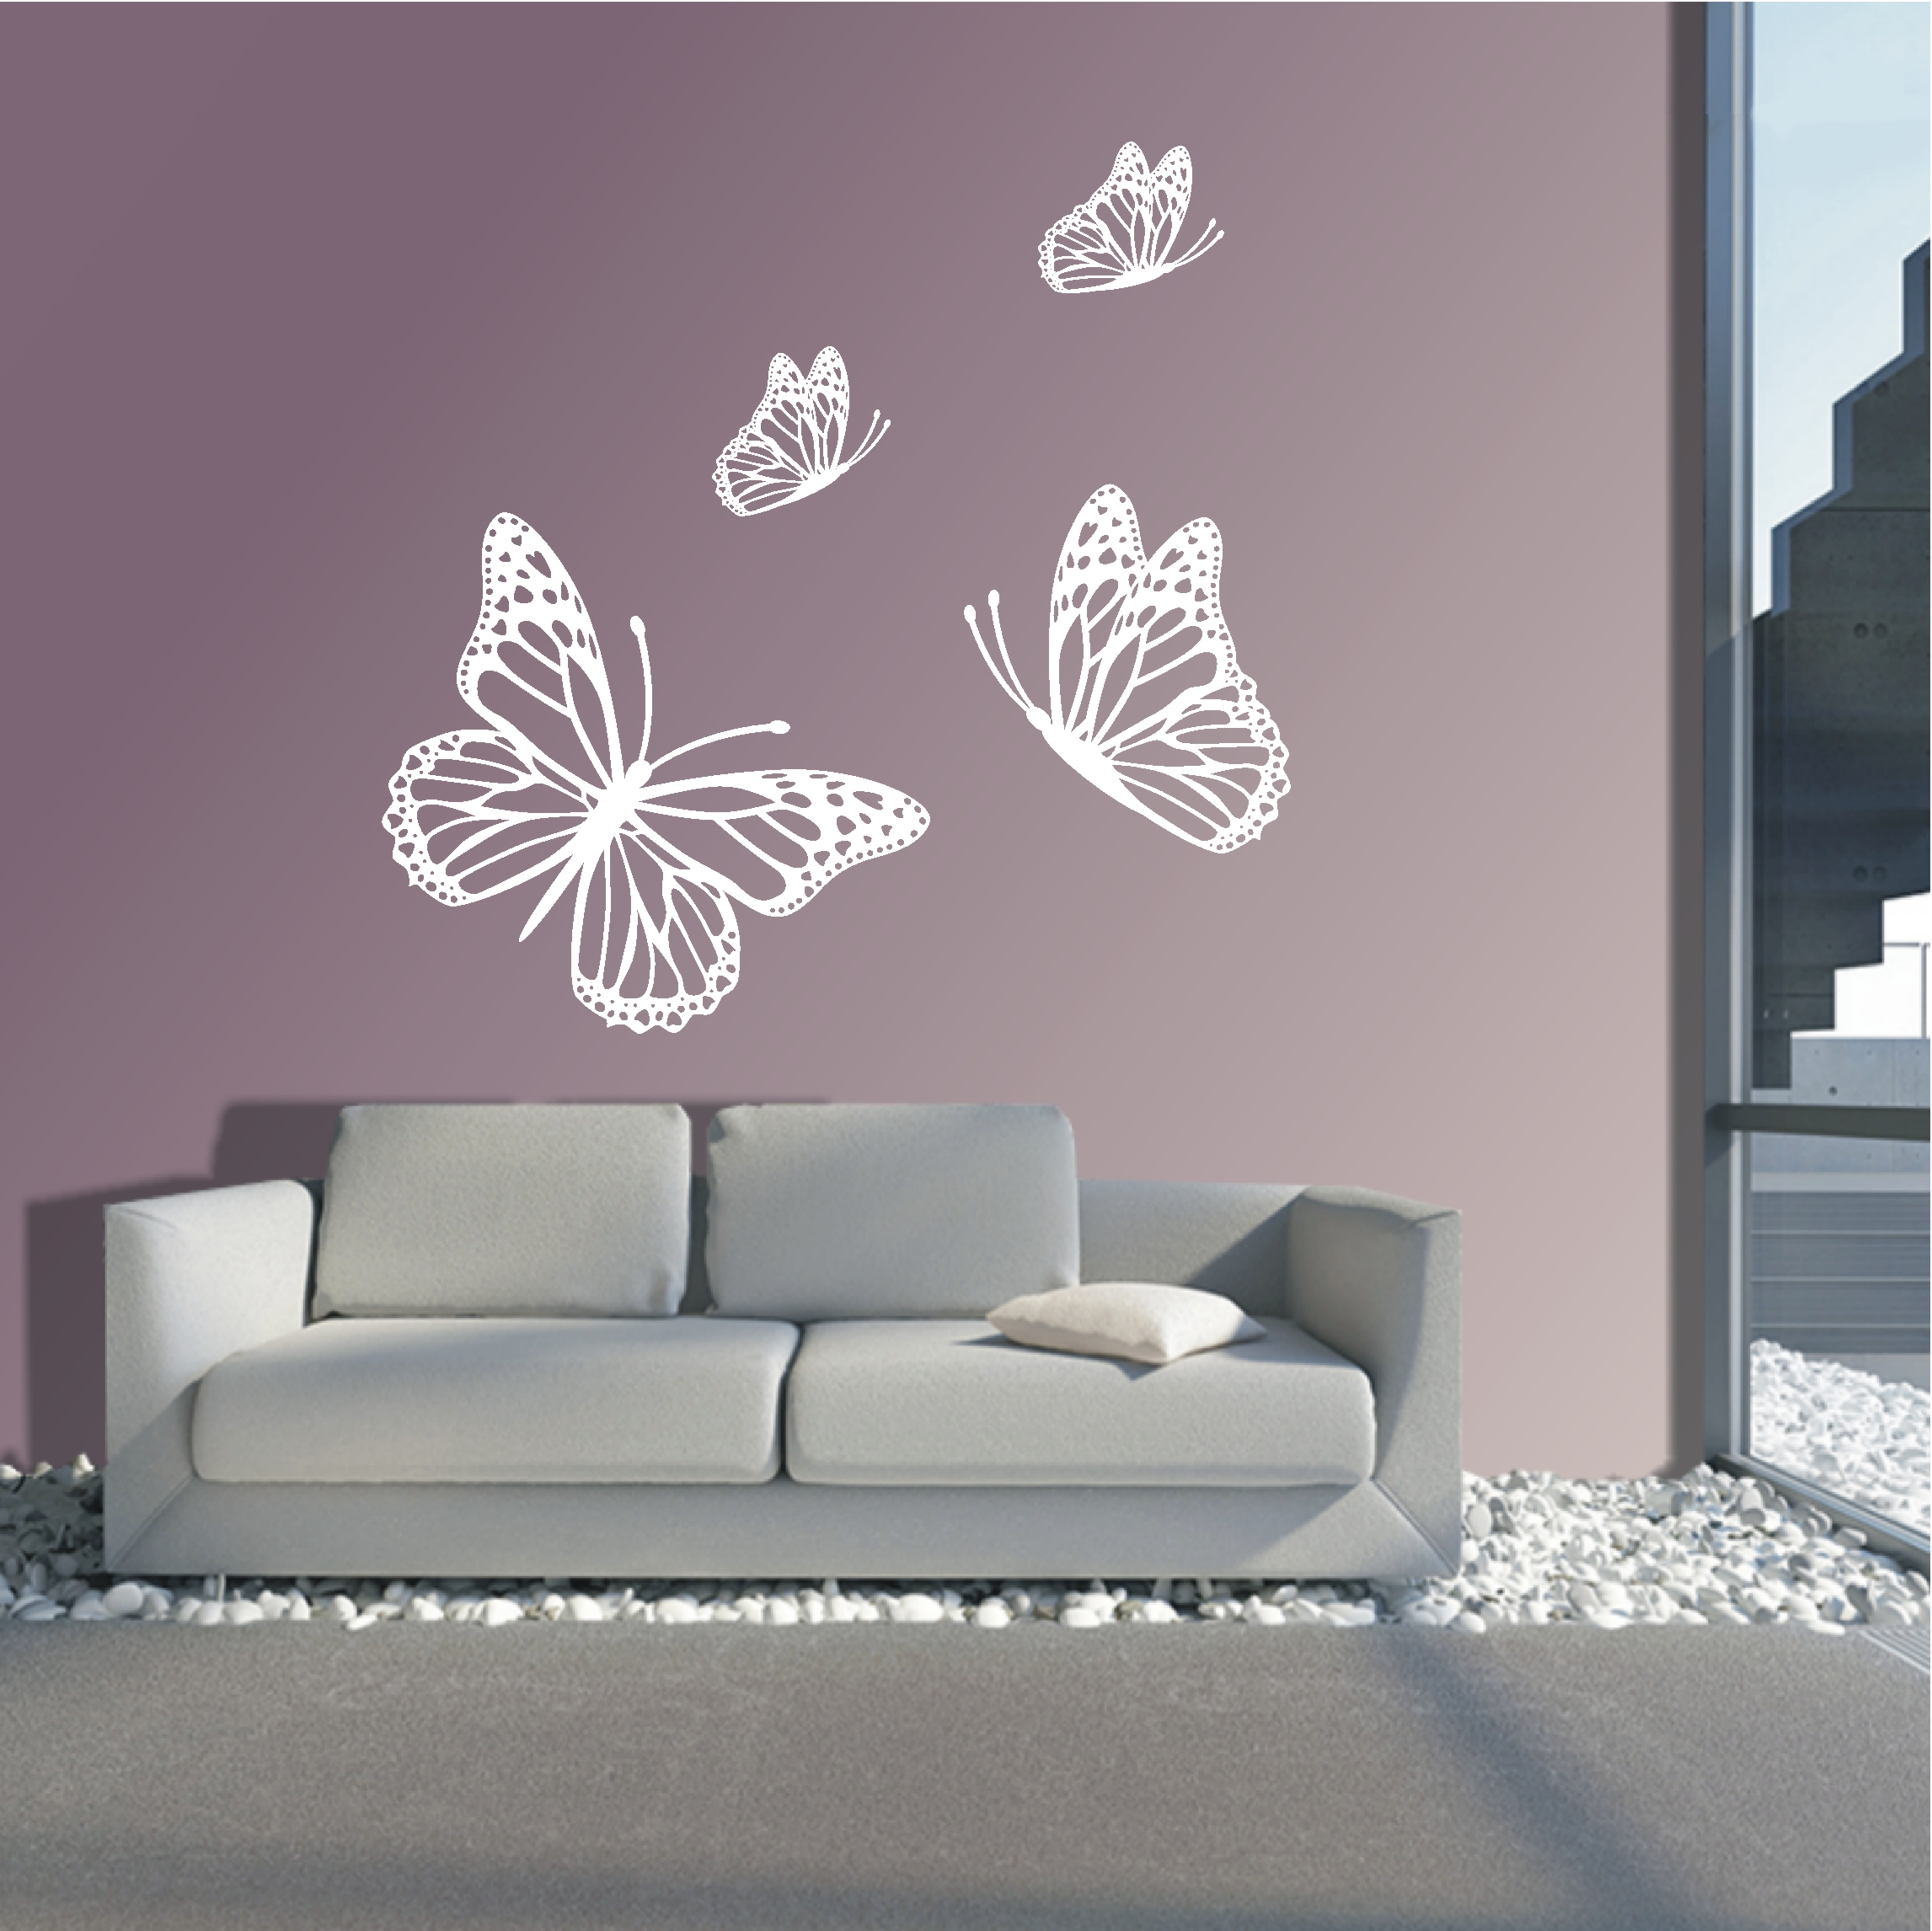 Deko Shop 24 De Wandtattoo Schmetterlinge Deko Shop 24 De